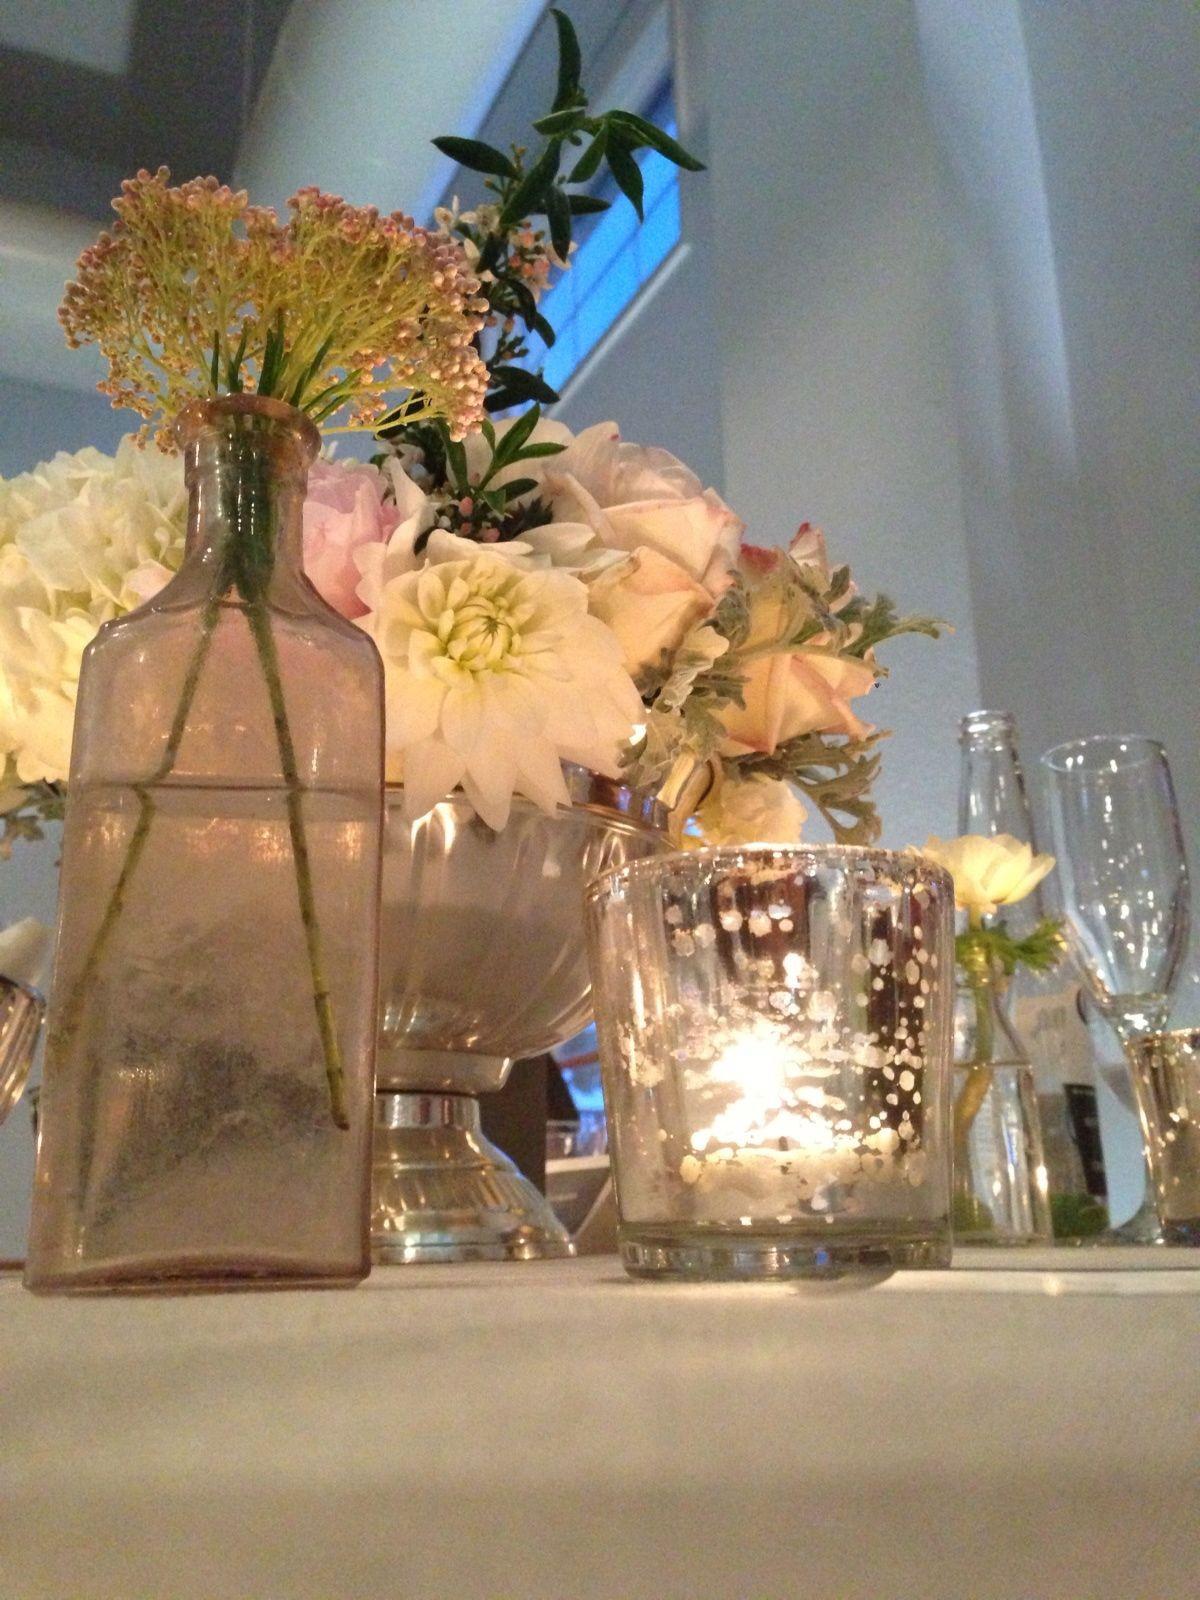 gold mercury hurricane vase of flowers reception candles centerpieces table decoration vase with regard to wedding table decor mercury votive candles and bud vases silver vintage antique centerpiece